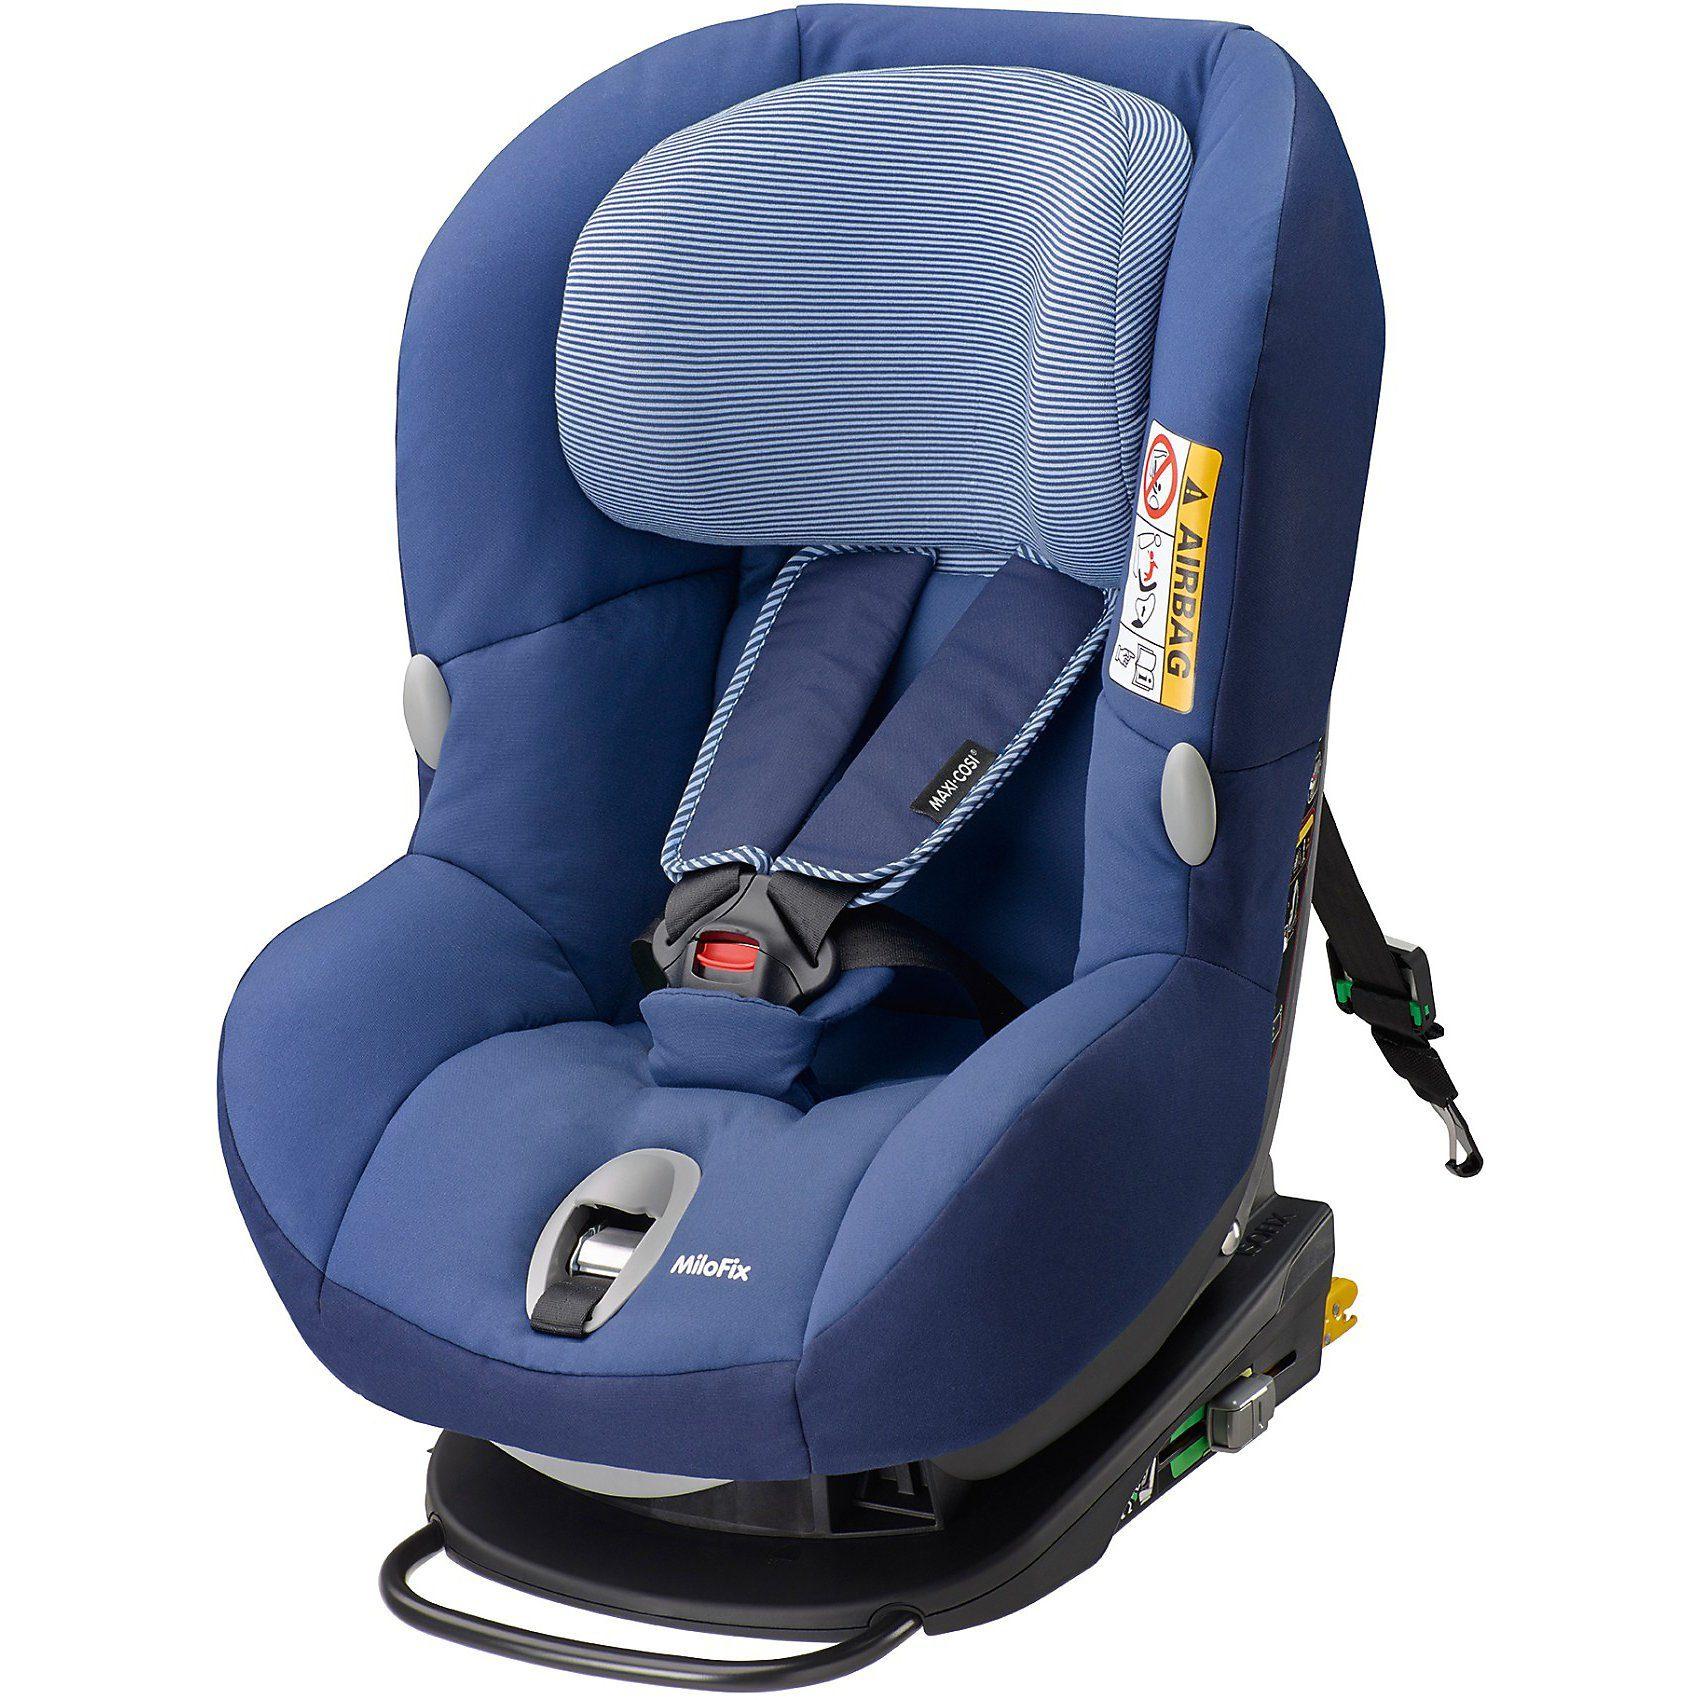 Maxi-Cosi Auto-Kindersitz MiloFix, River Blue, 2017